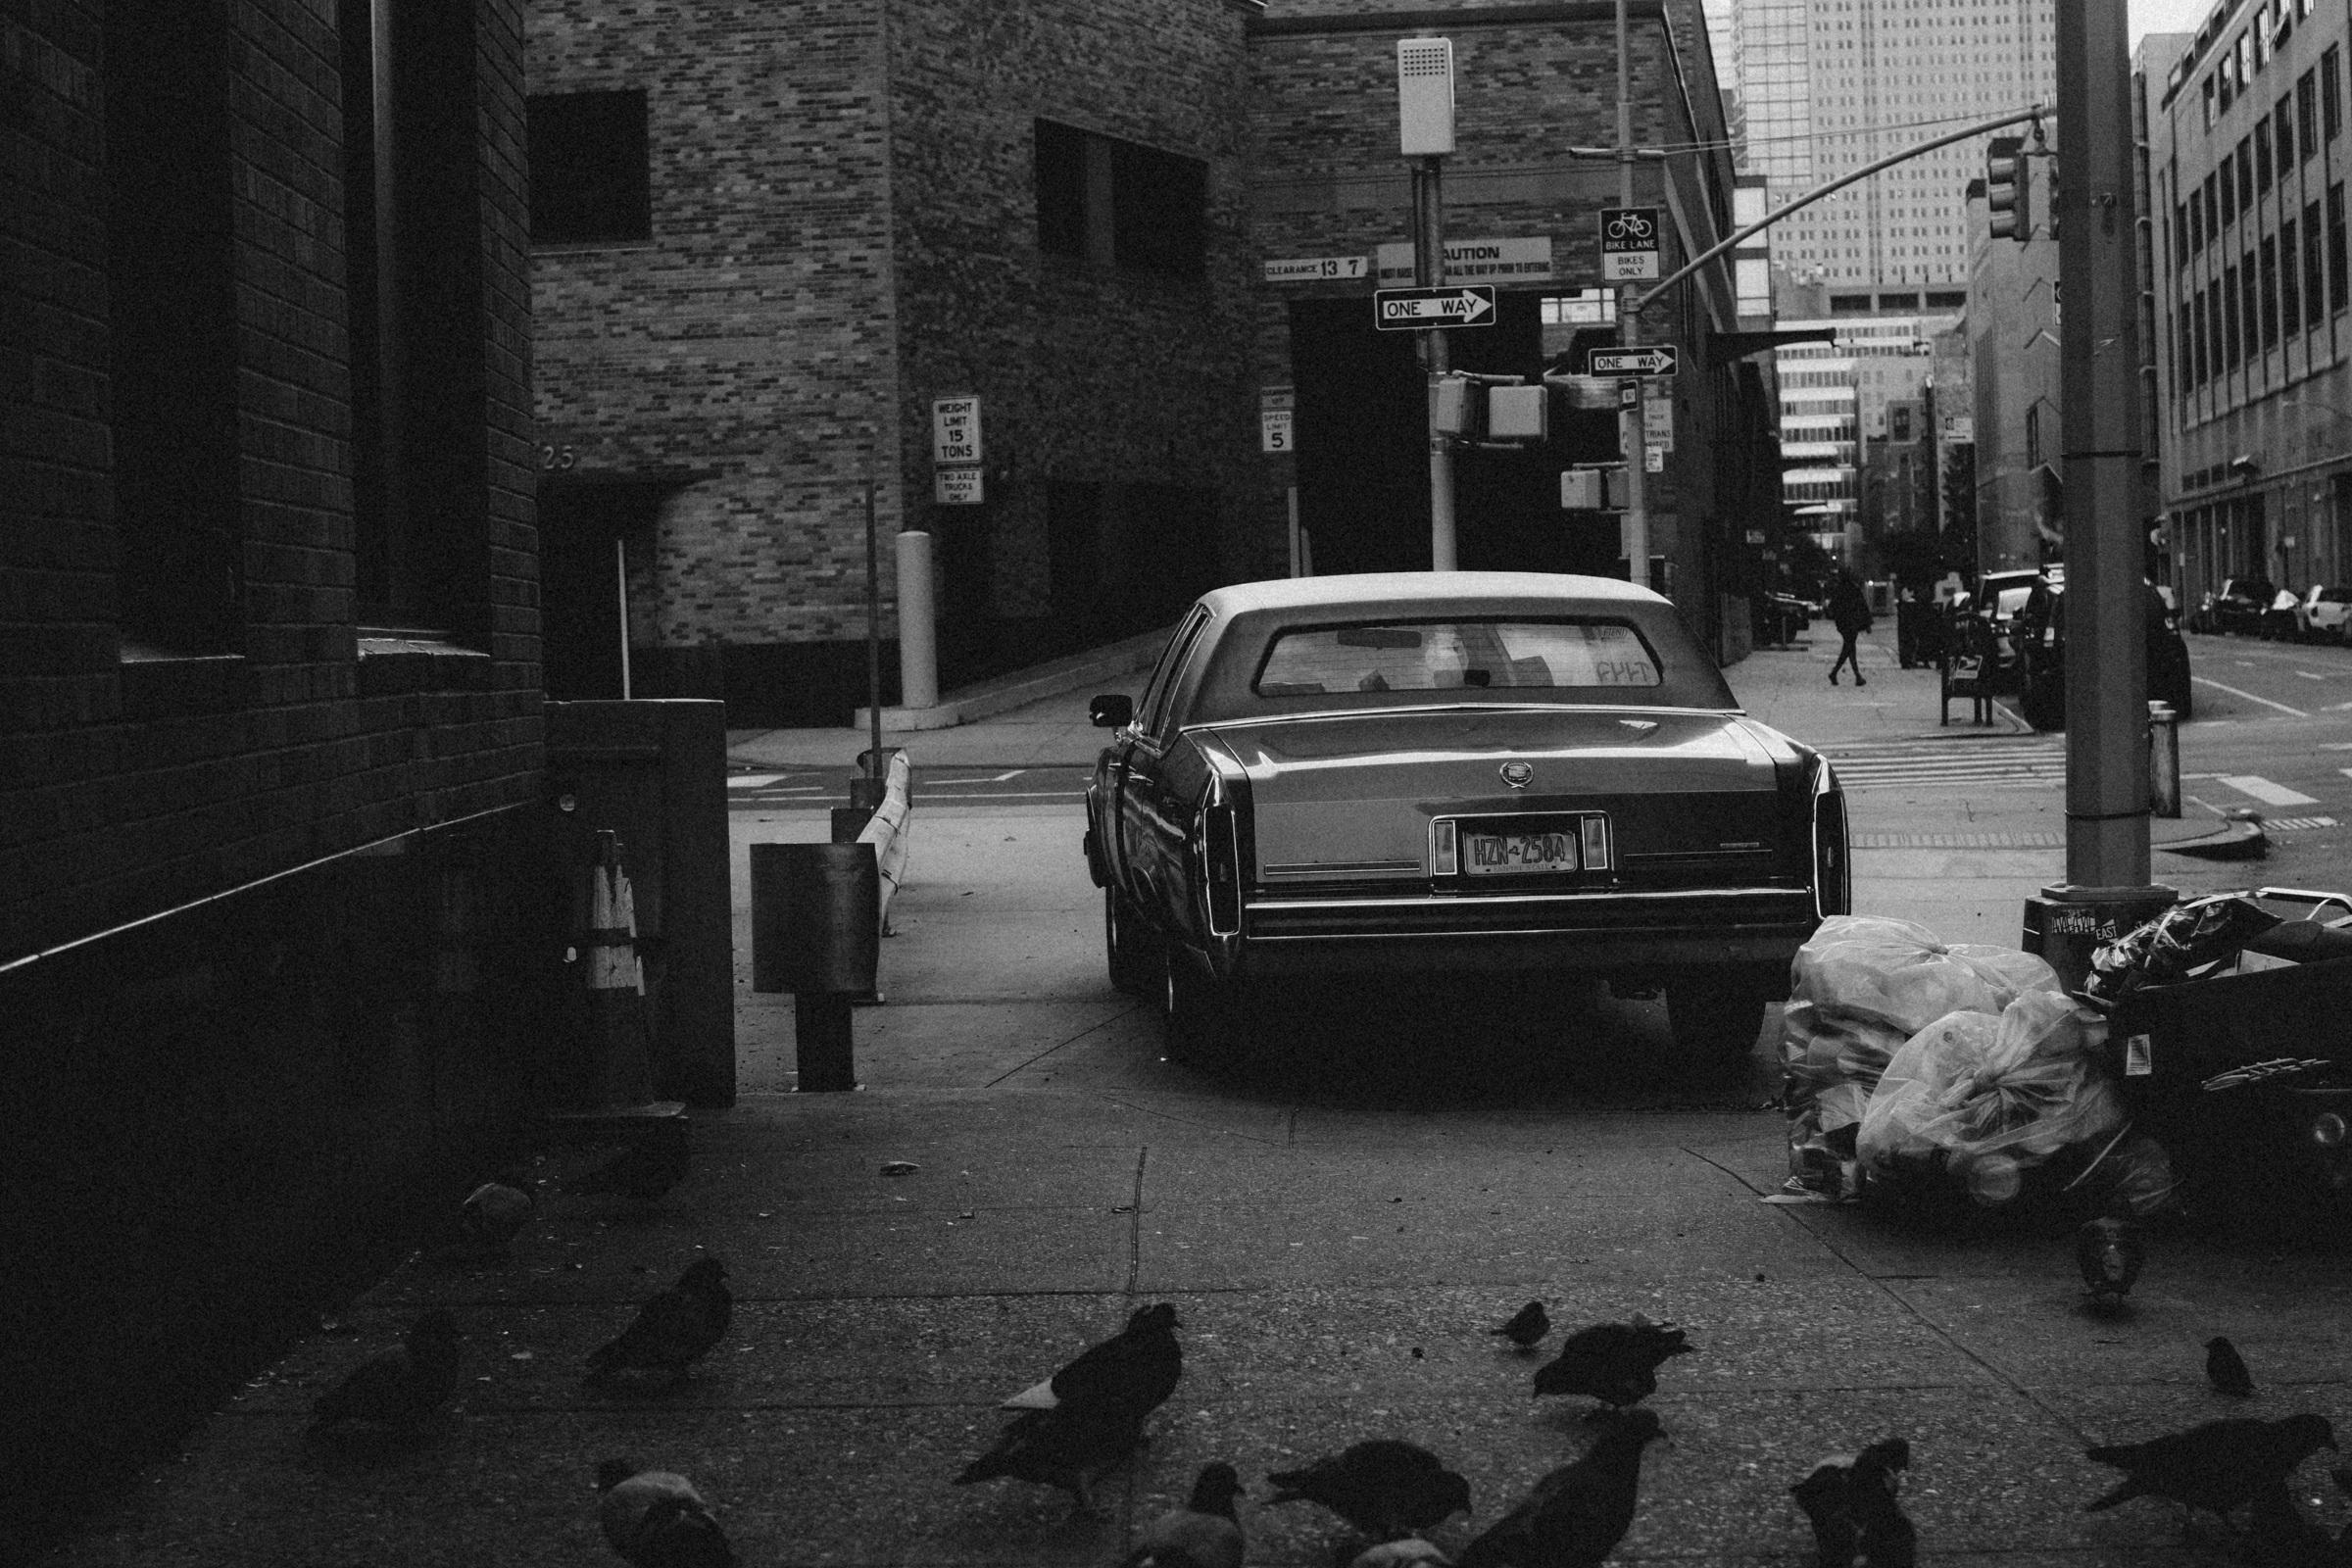 nyc - 2018 - 1 week in the city of dreams.